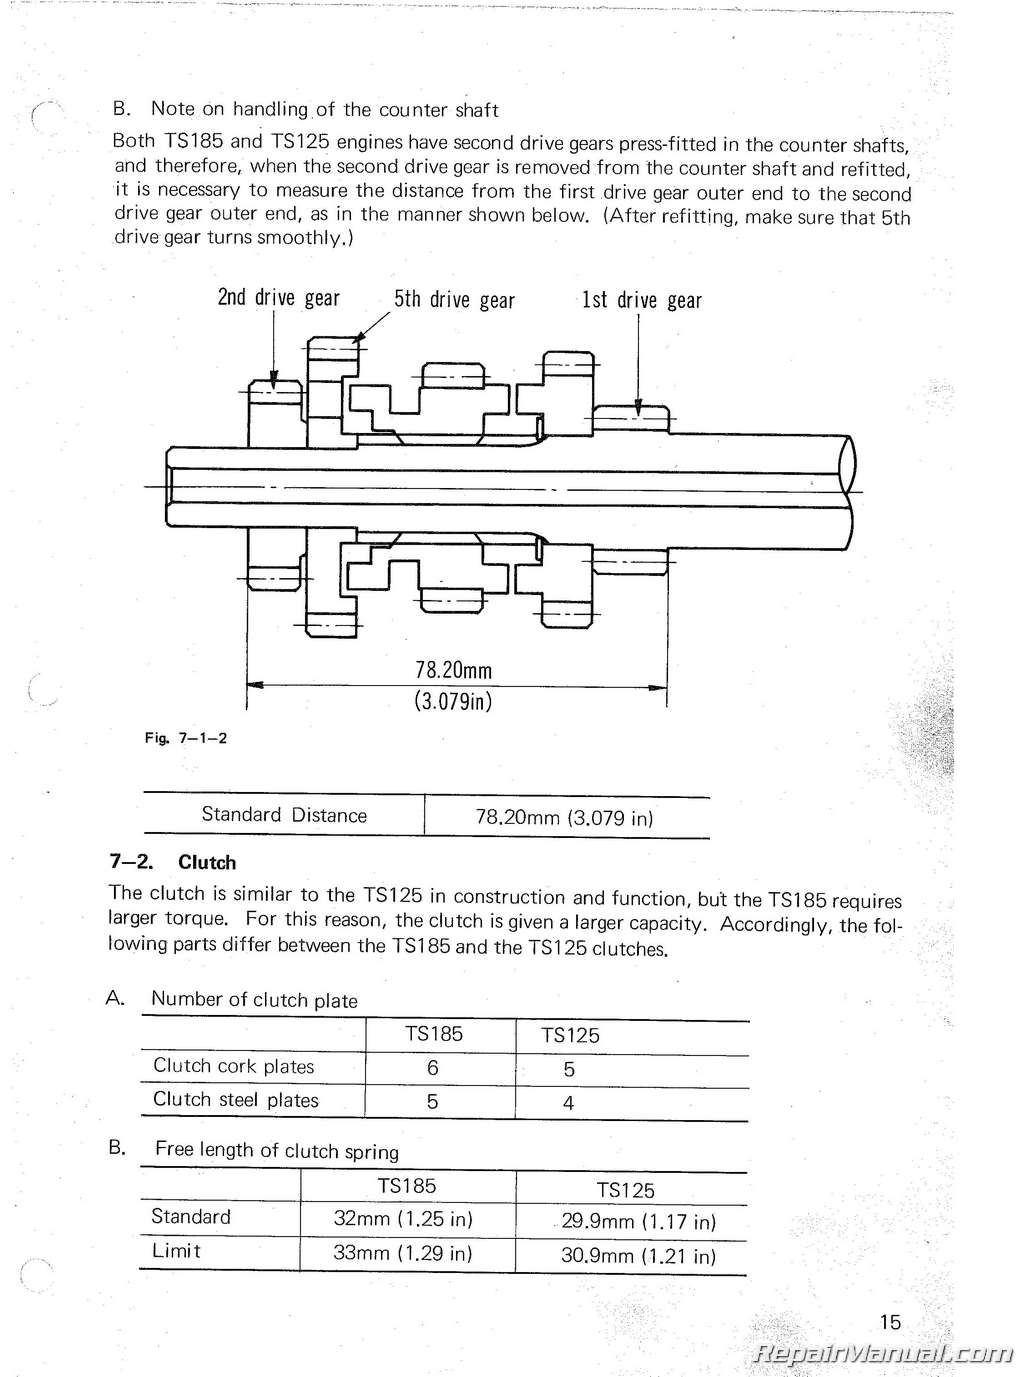 Astonishing 1971 1976 Suzuki Ts185 Sierra Supplemental Motorcycle Service Manual Wiring Cloud Licukaidewilluminateatxorg